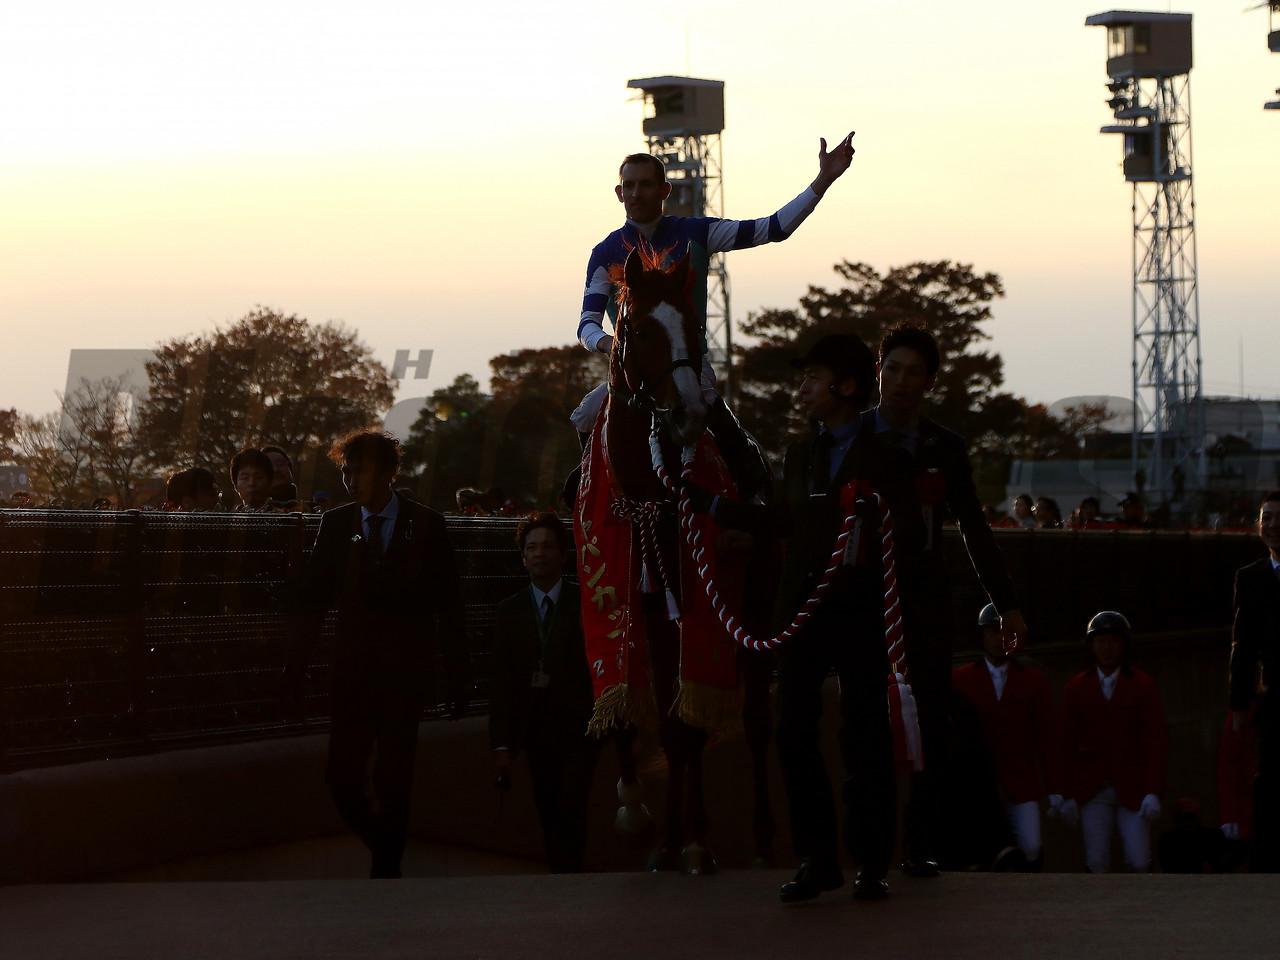 Cheval Grand, Hugh Bowman, Japan Cup, G1, Tokyo Racecourse, November 26 2017